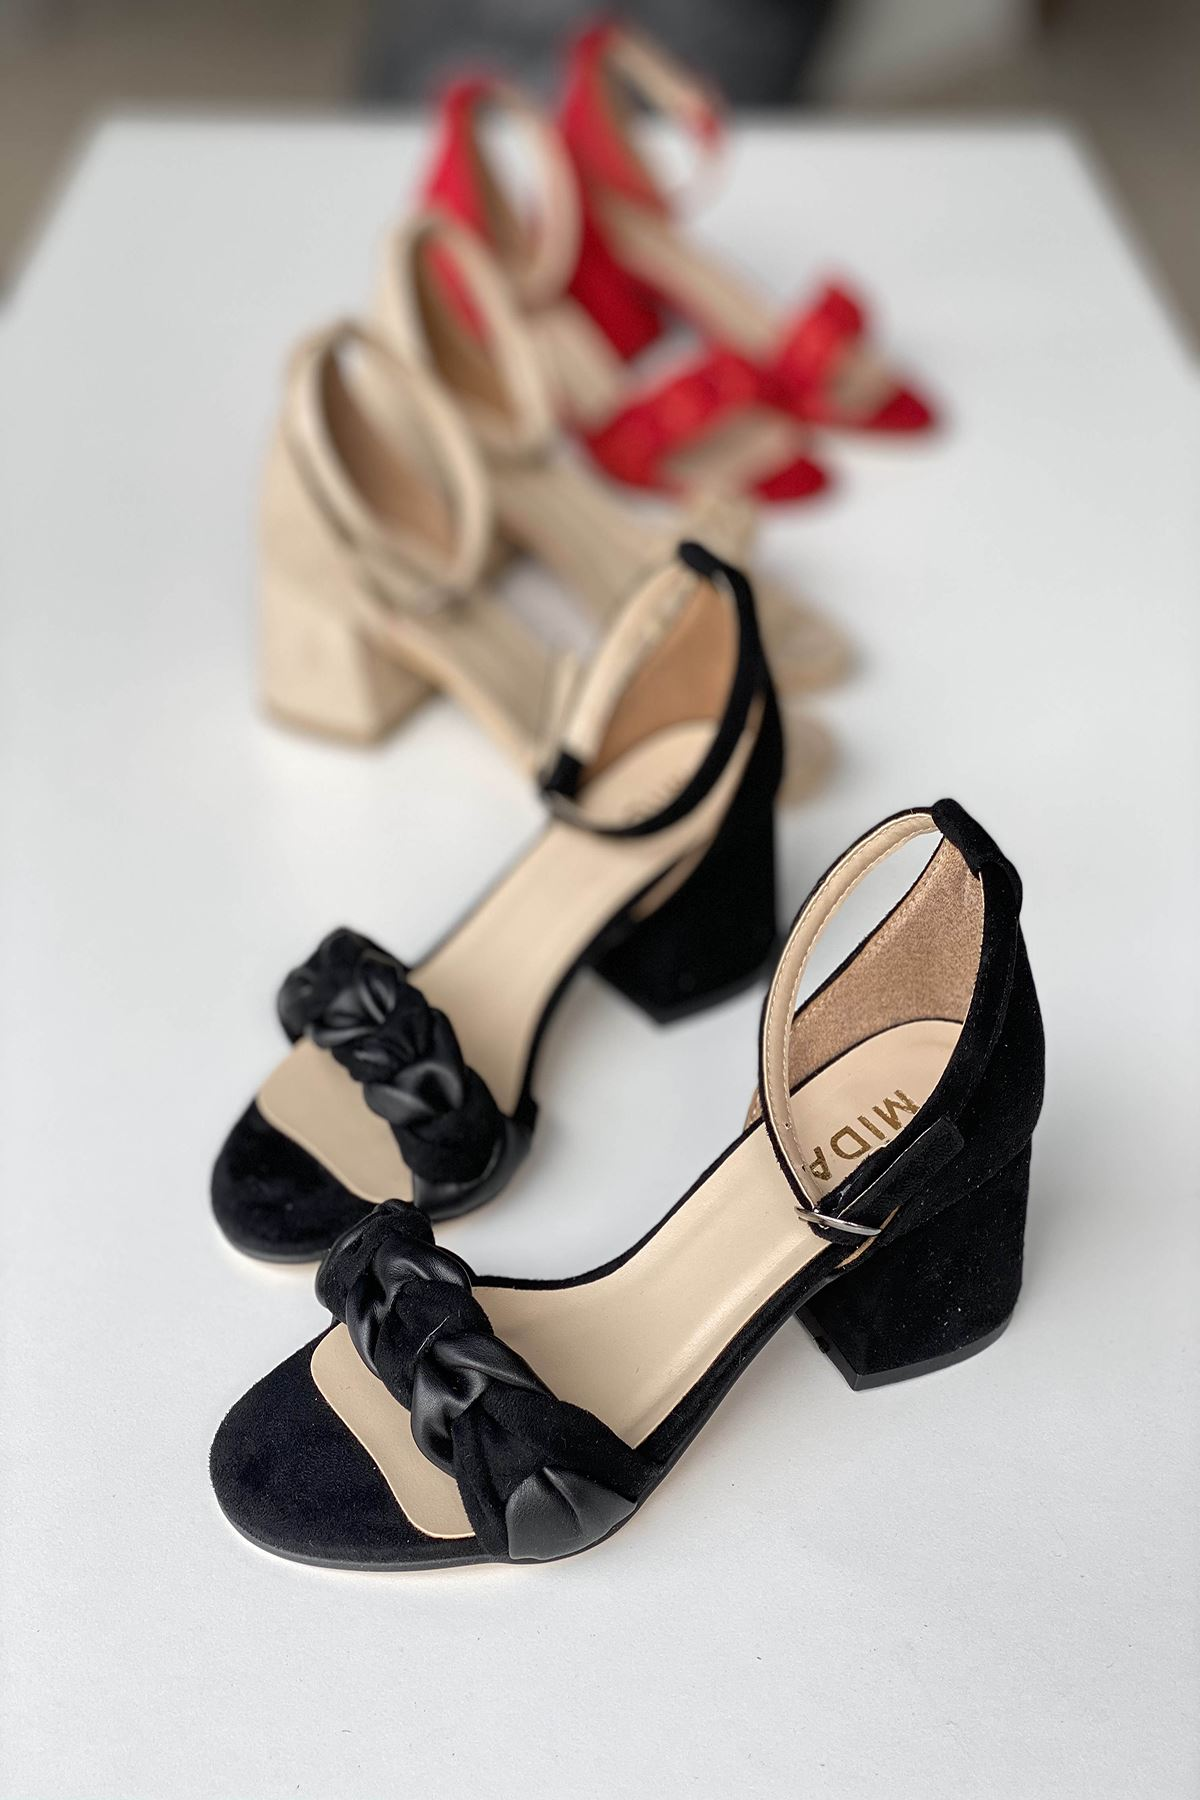 Y555 Siyah Deri Topuklu Ayakkabı